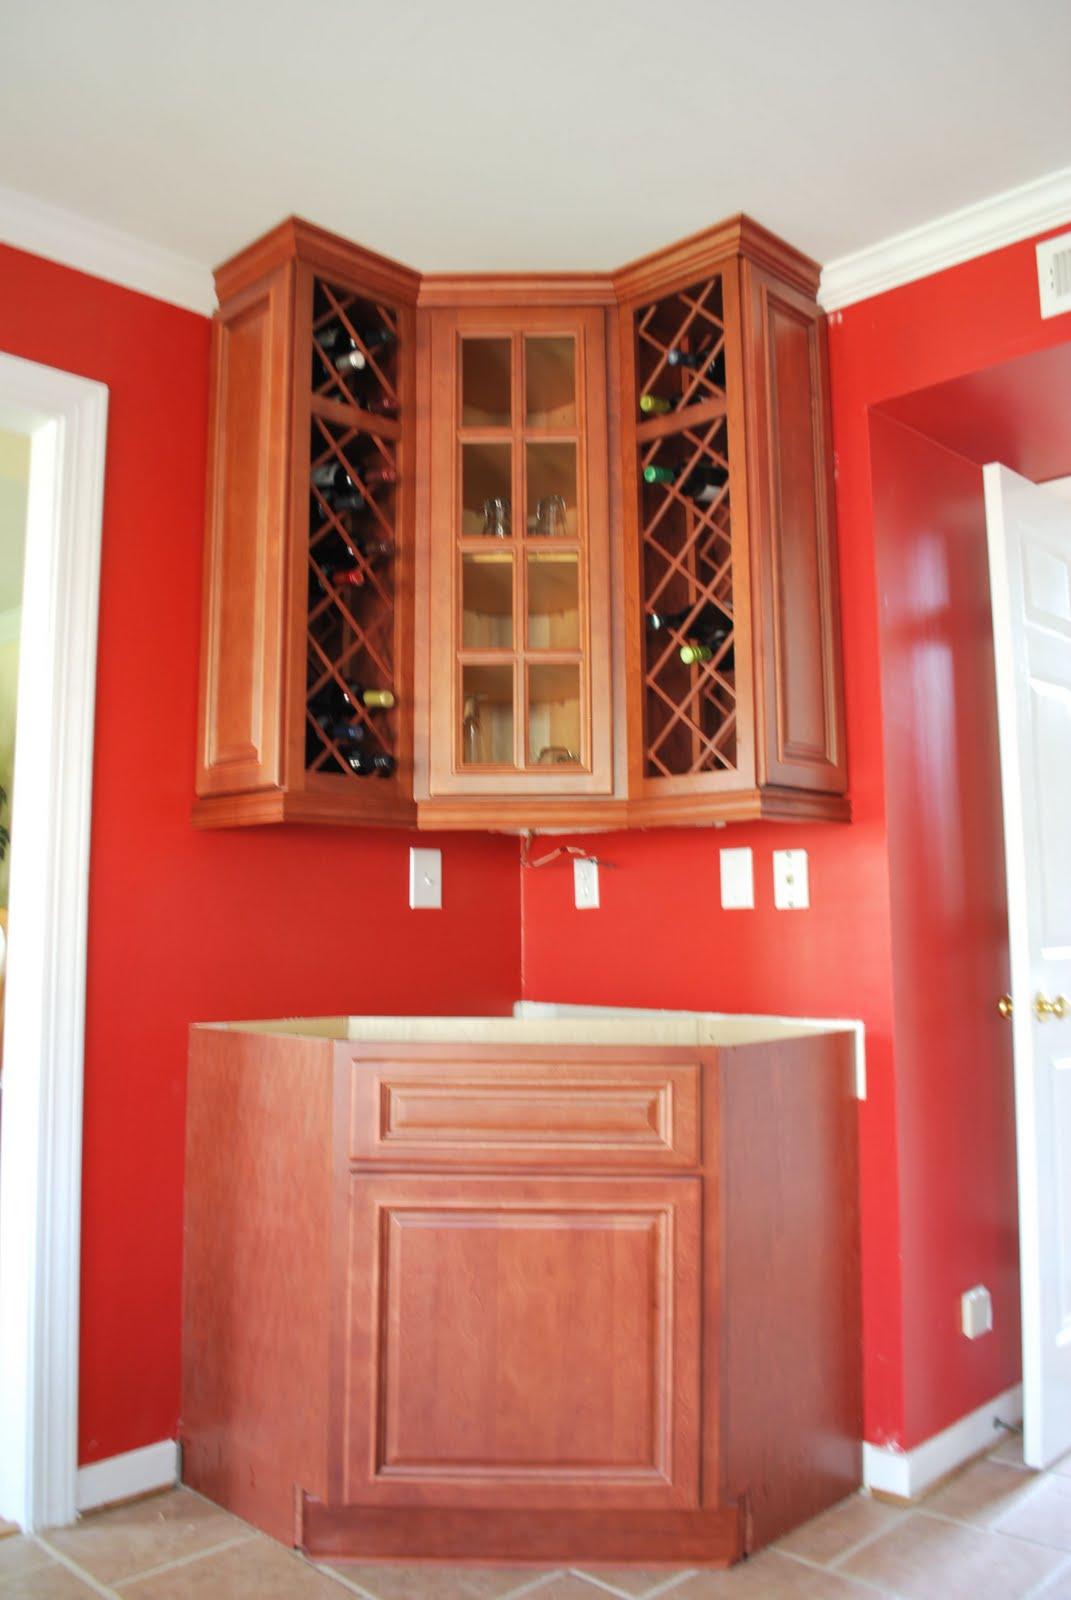 Envy Kitchens 804-551-6840: Custom Corner Wine Rack